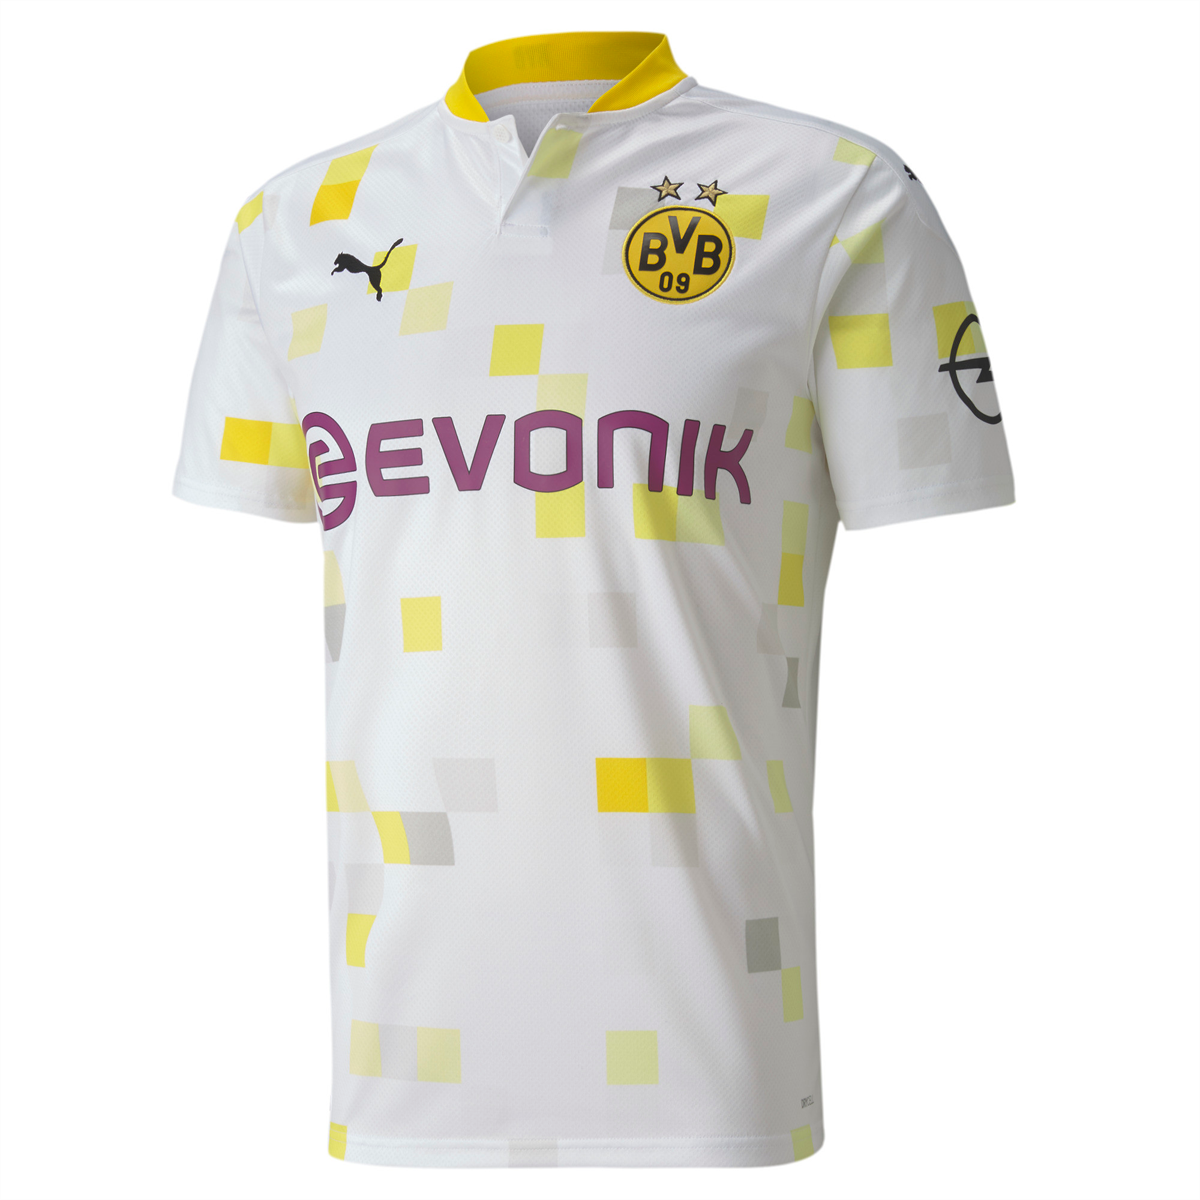 Men S Replica Puma Borussia Dortmund Third Away Cup Jersey 20 21 Soccer Com In 2021 Borussia Dortmund Dortmund Soccer Jersey